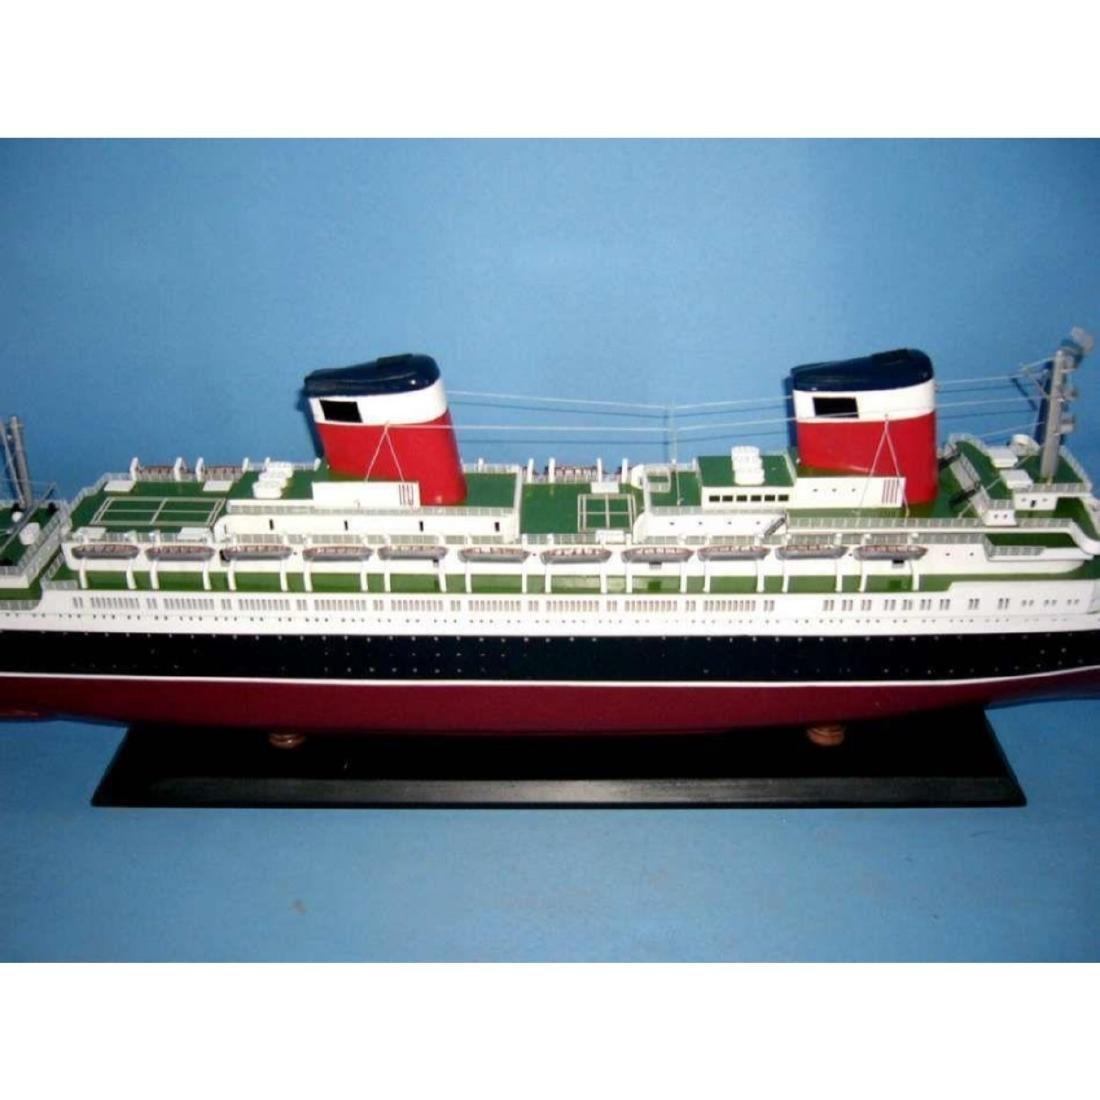 "SS United States Limited Model Cruise Ship 40"" w/ LED - 3"